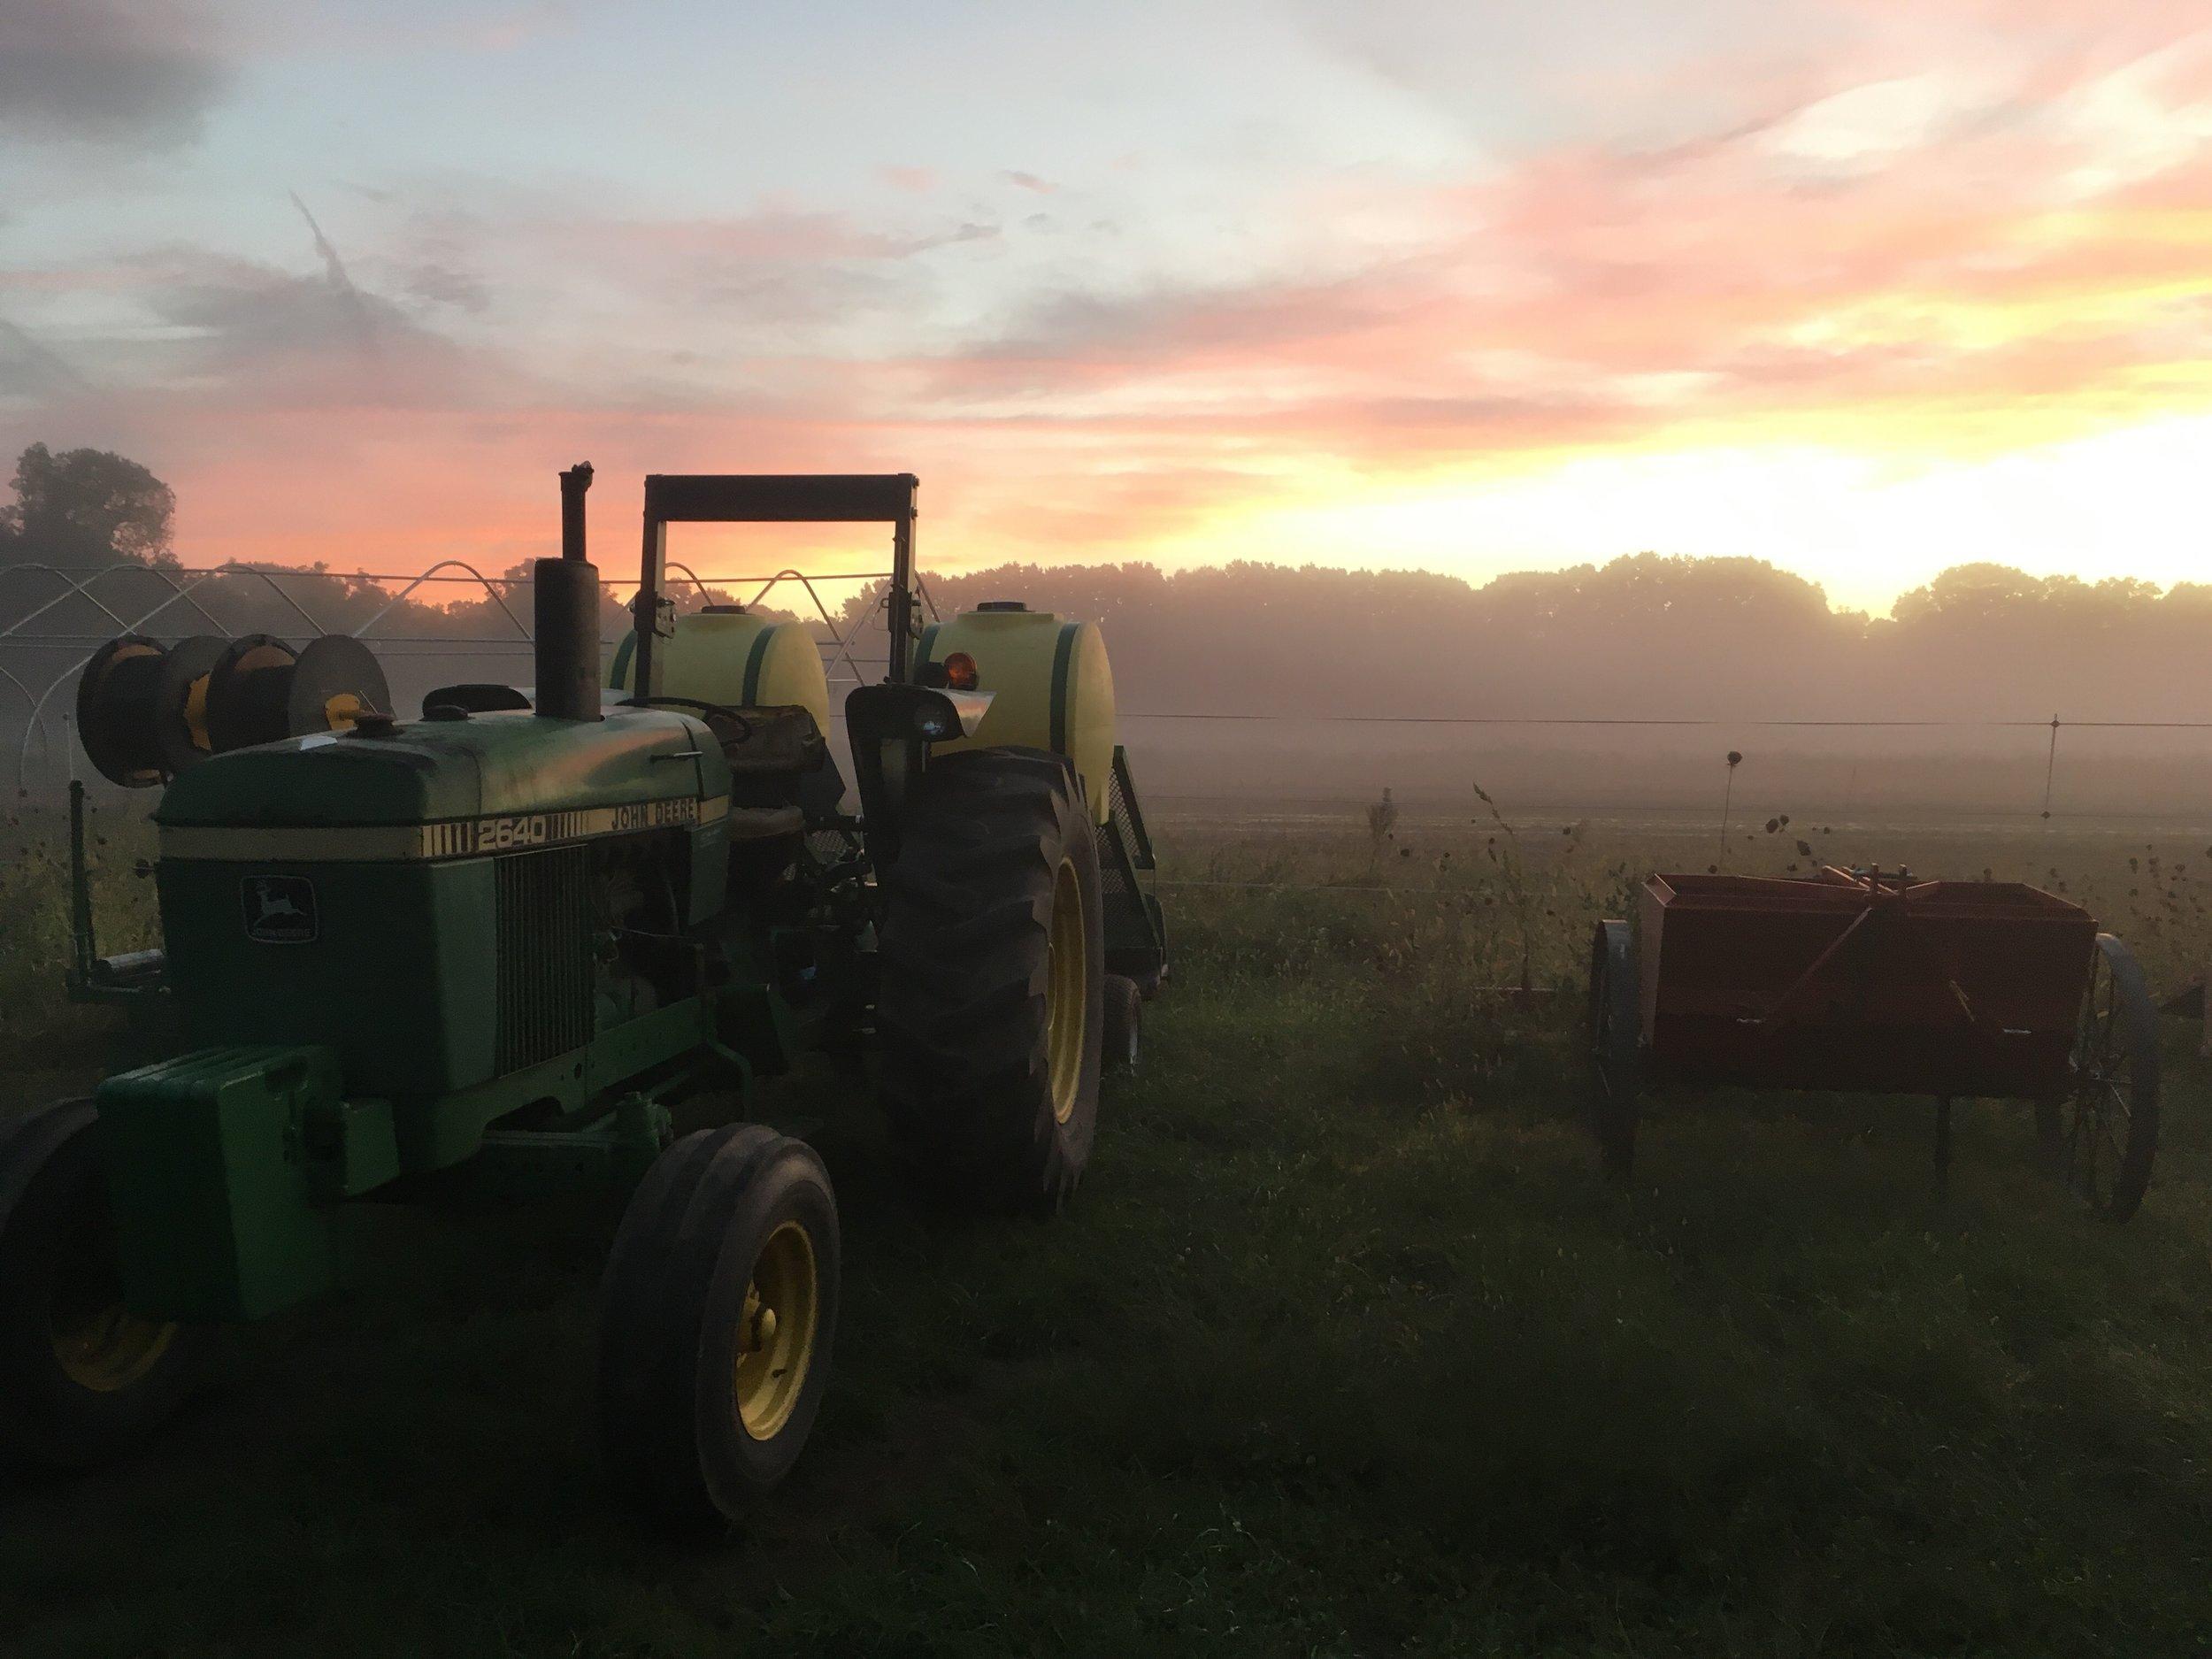 Fall on the farm is prime sunset photo season!